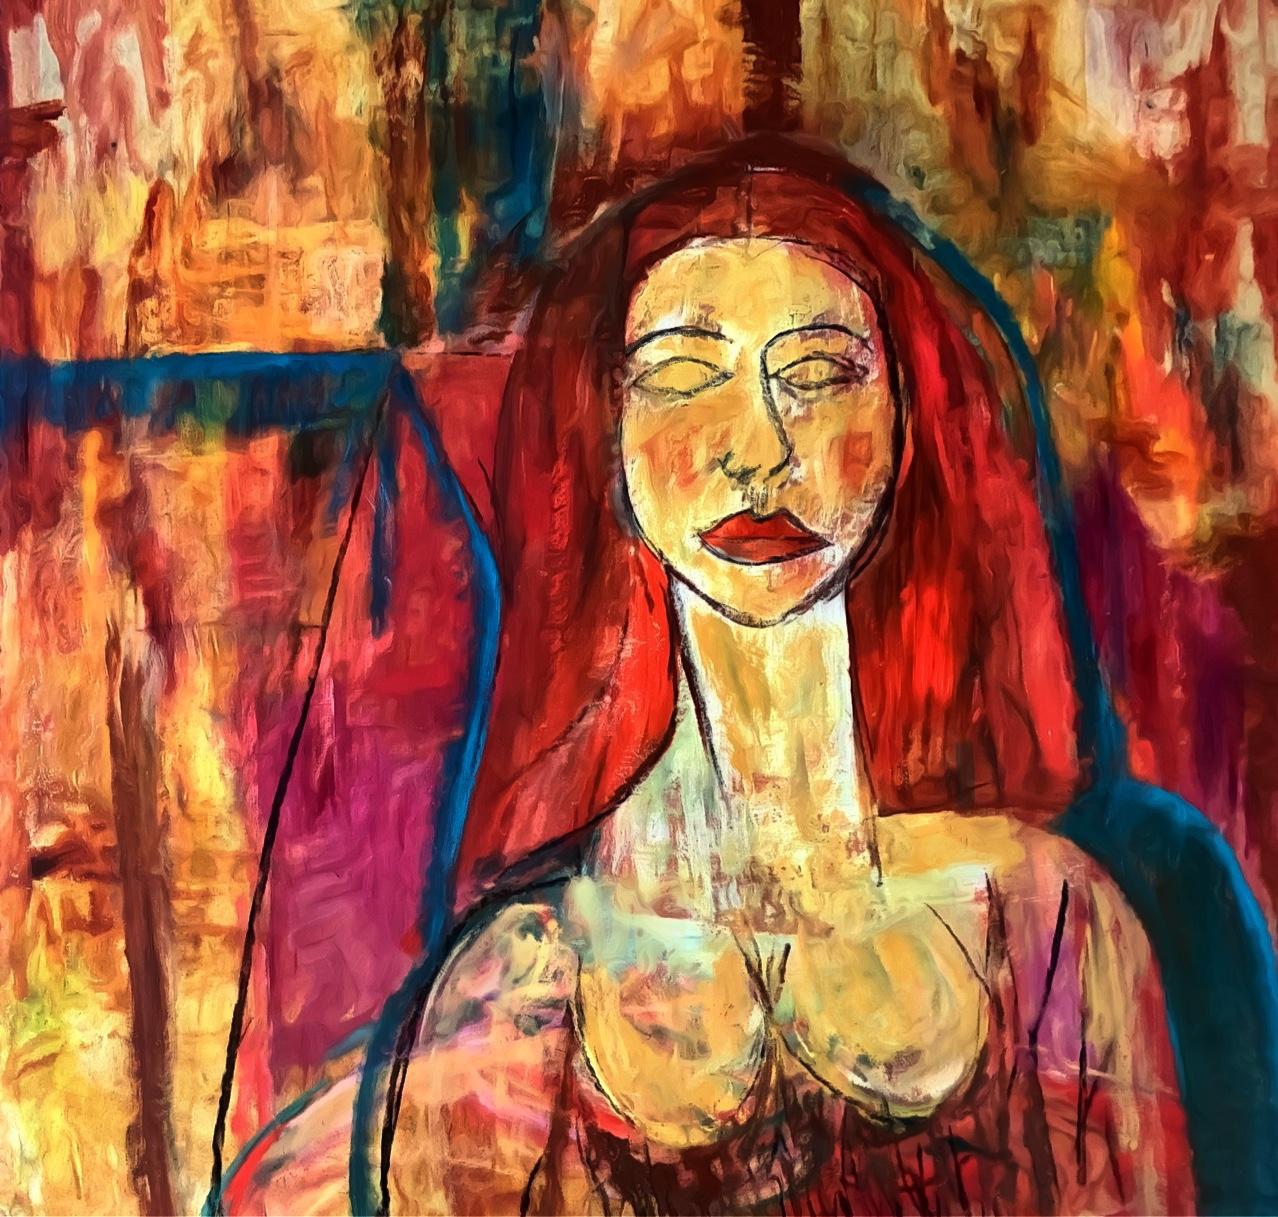 Mujer de pelo rojo (2021) - Soledad Fernandez Fernandez